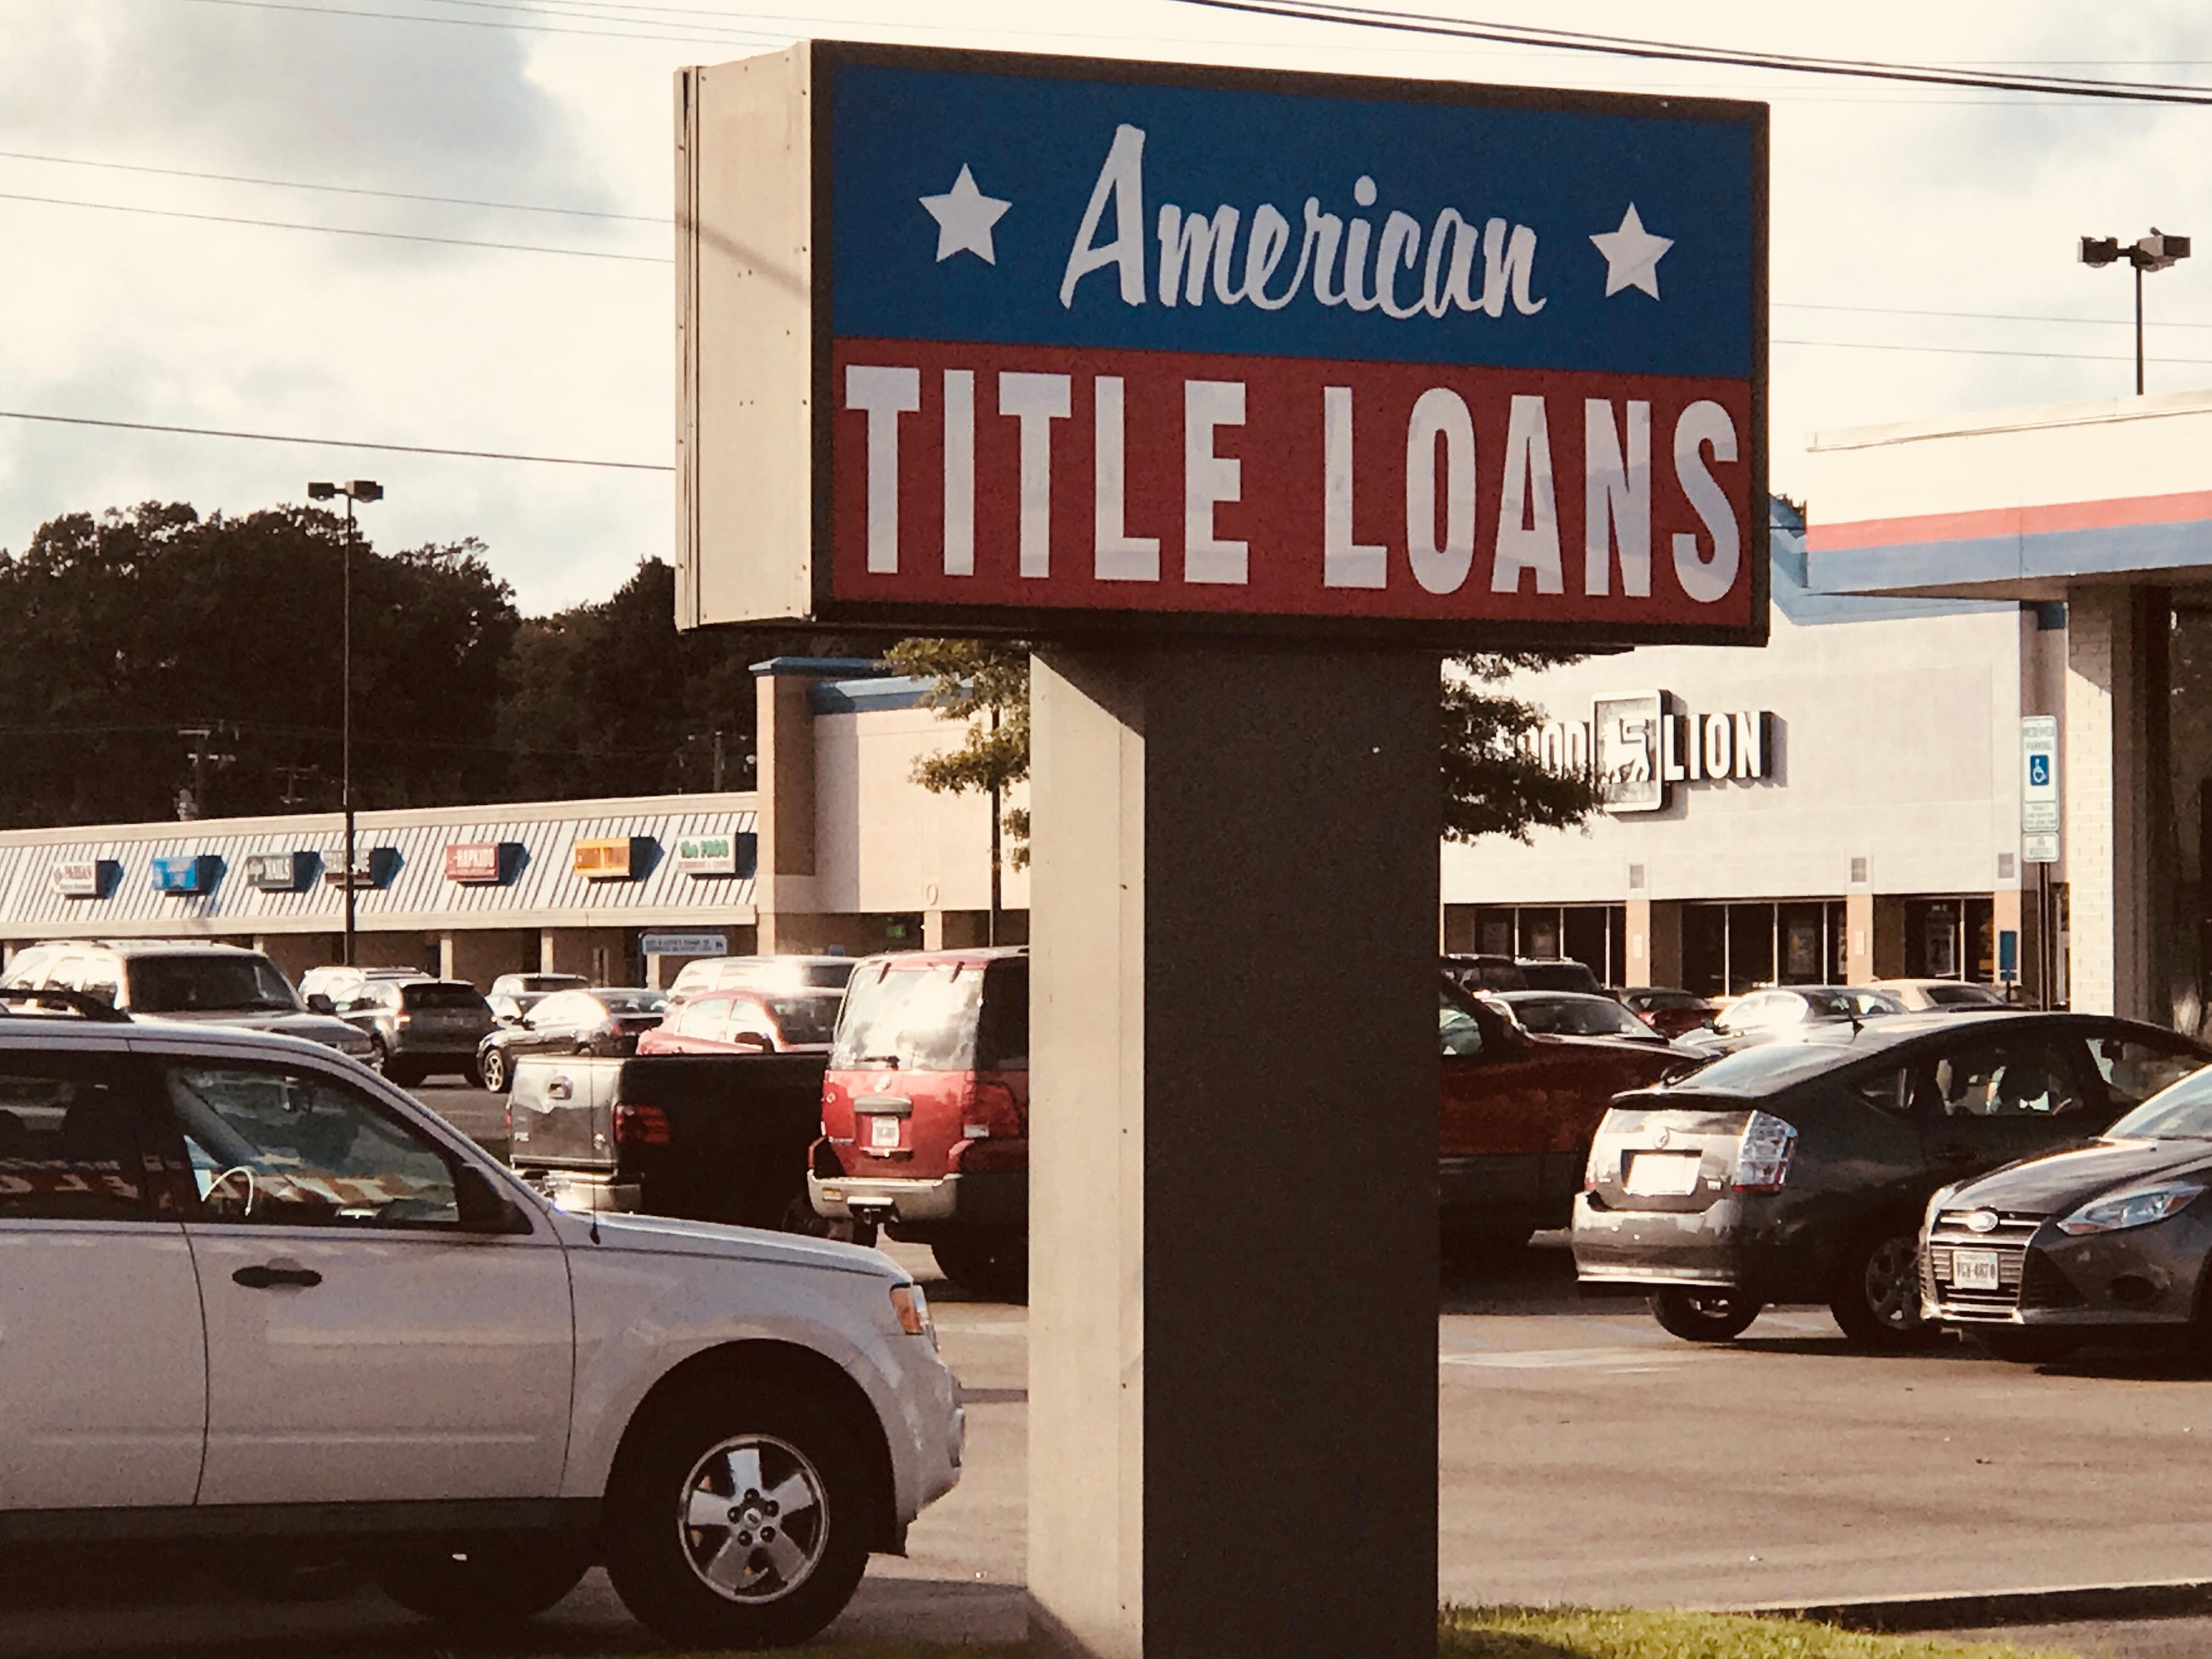 American Title Loans image 2